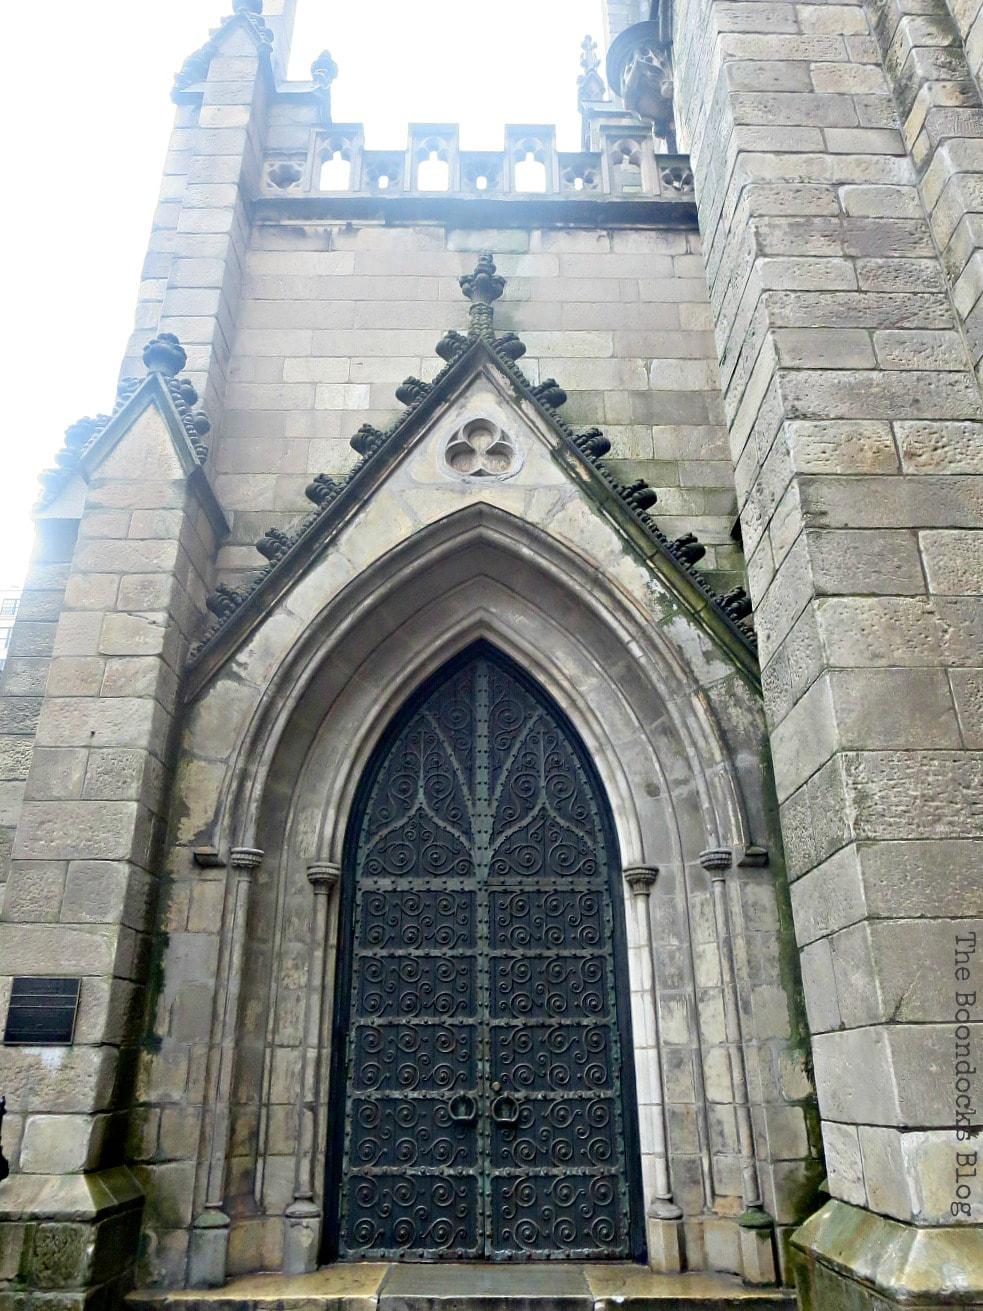 Grace church door, Interesting things to see in Greenwich Village www.theboondocksblog.com